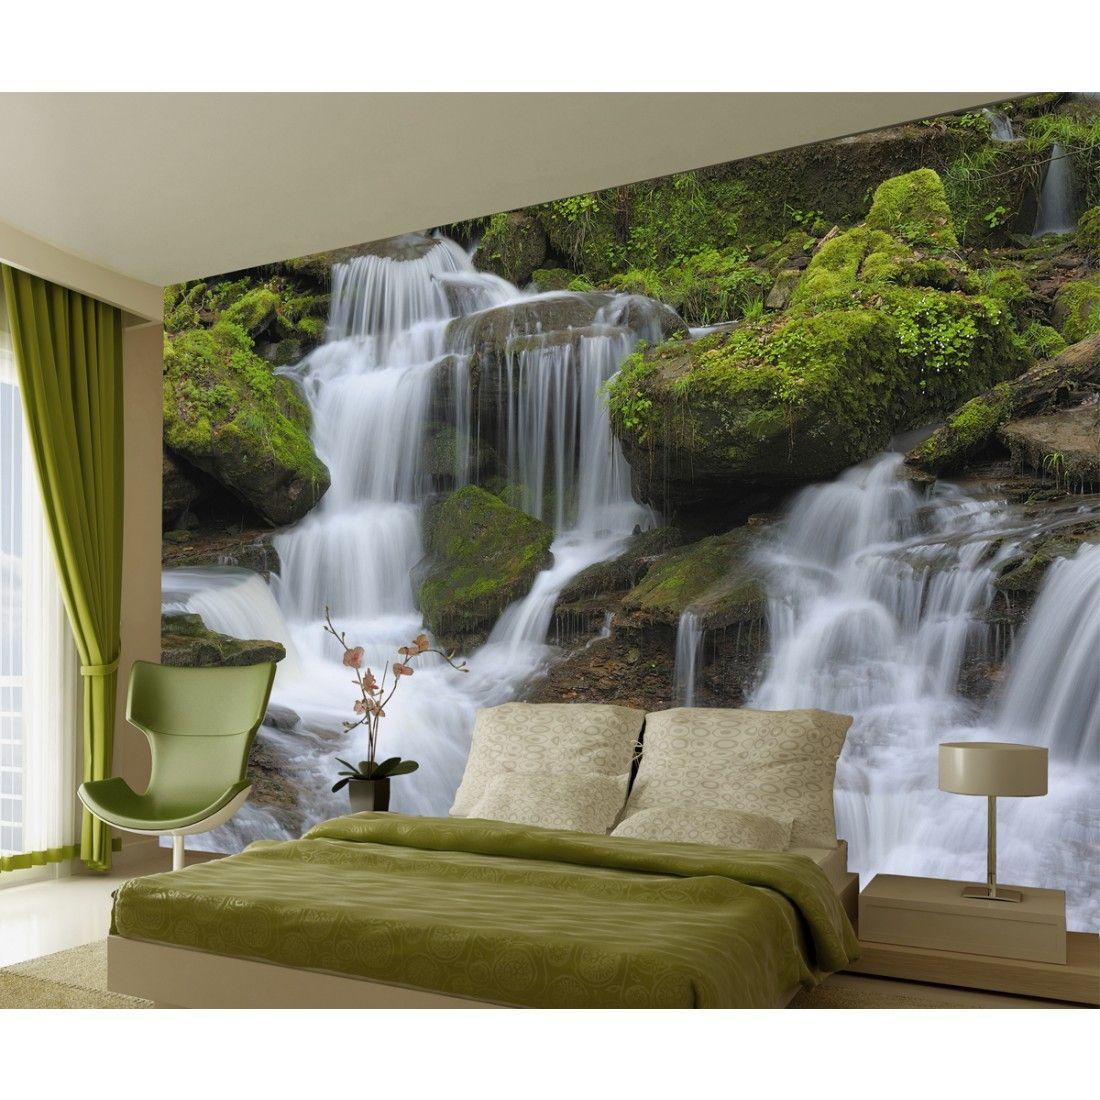 25 Wall Mural Designs: Waterfall And Rocks Wall Mural